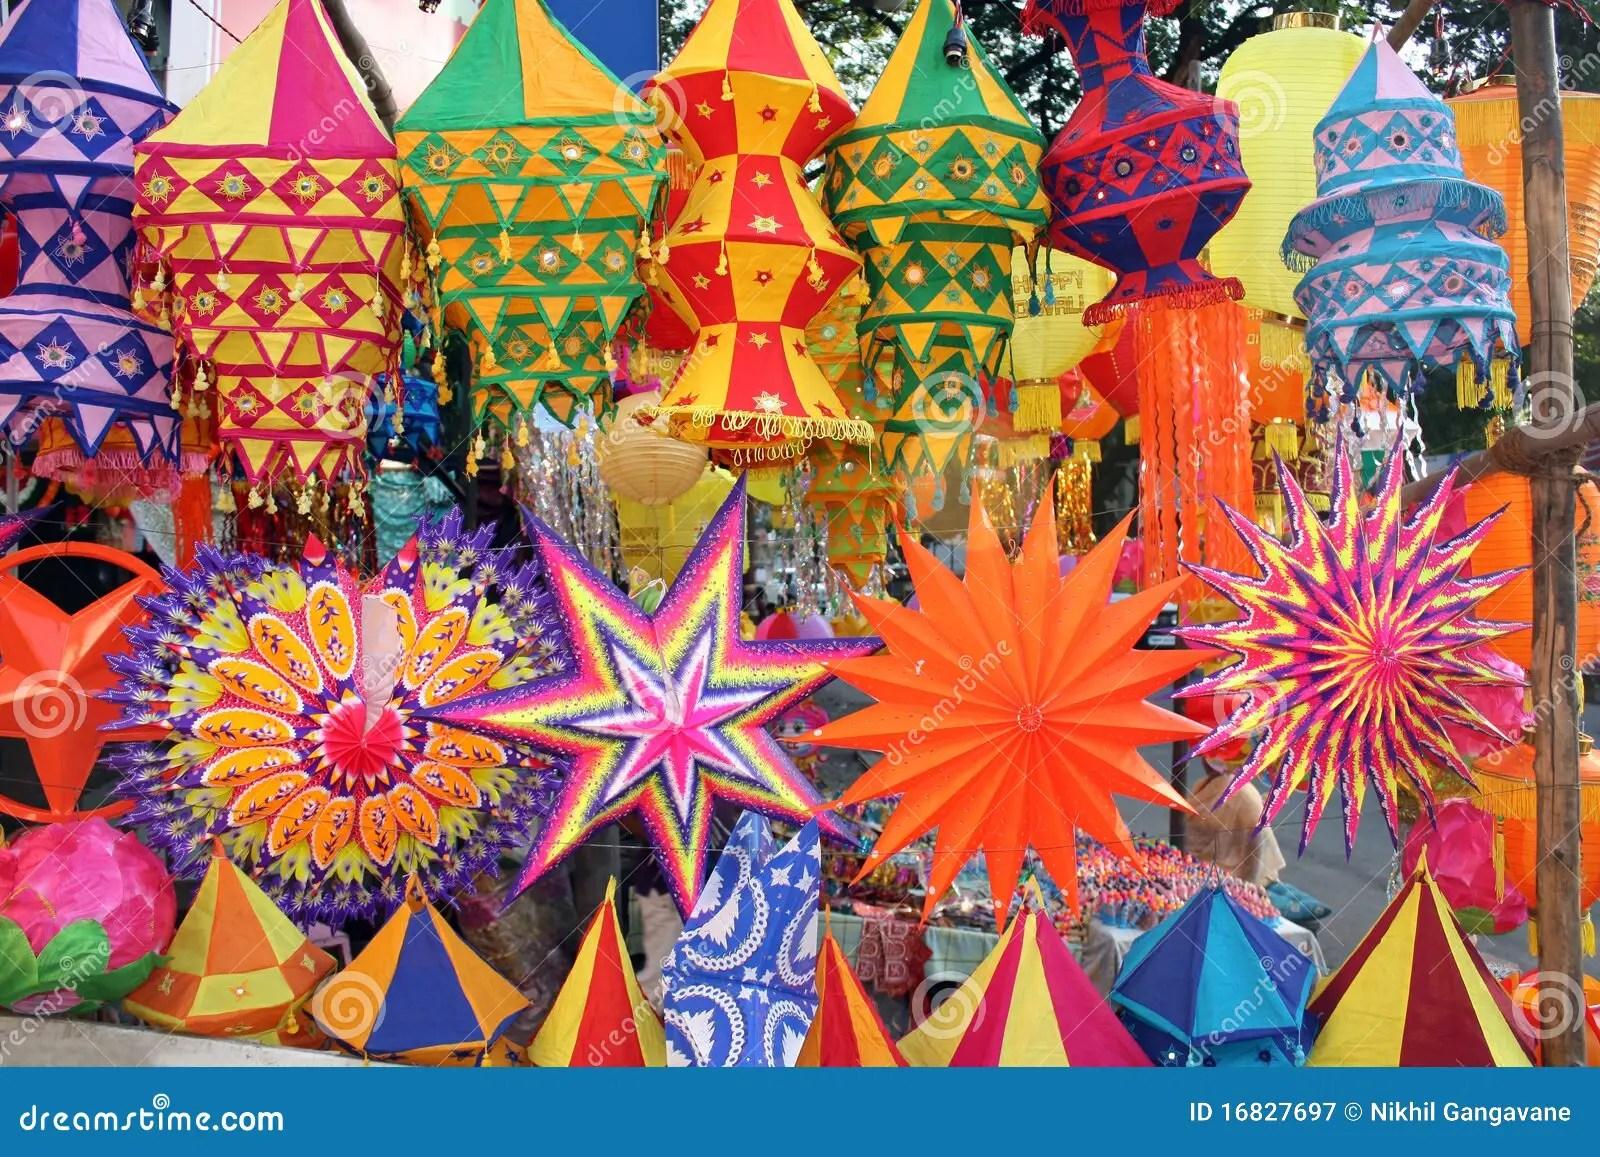 Colorful Diwali Lanterns Royalty Free Stock Photography  Image 16827697